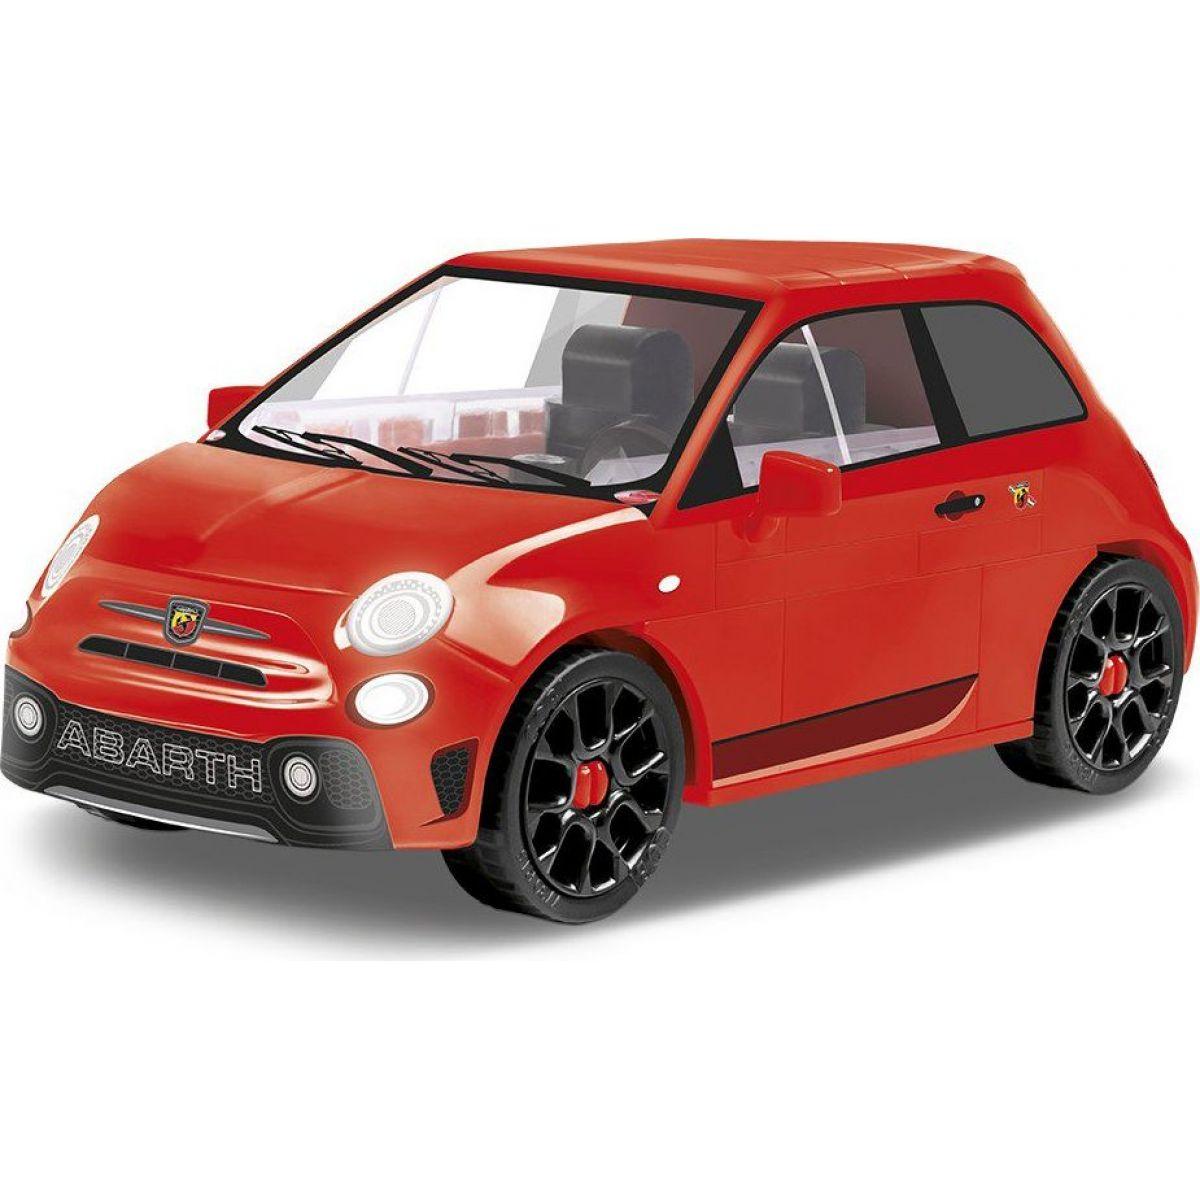 Cobi 24502 Youngtimer Fiat Abarth 595 1:35